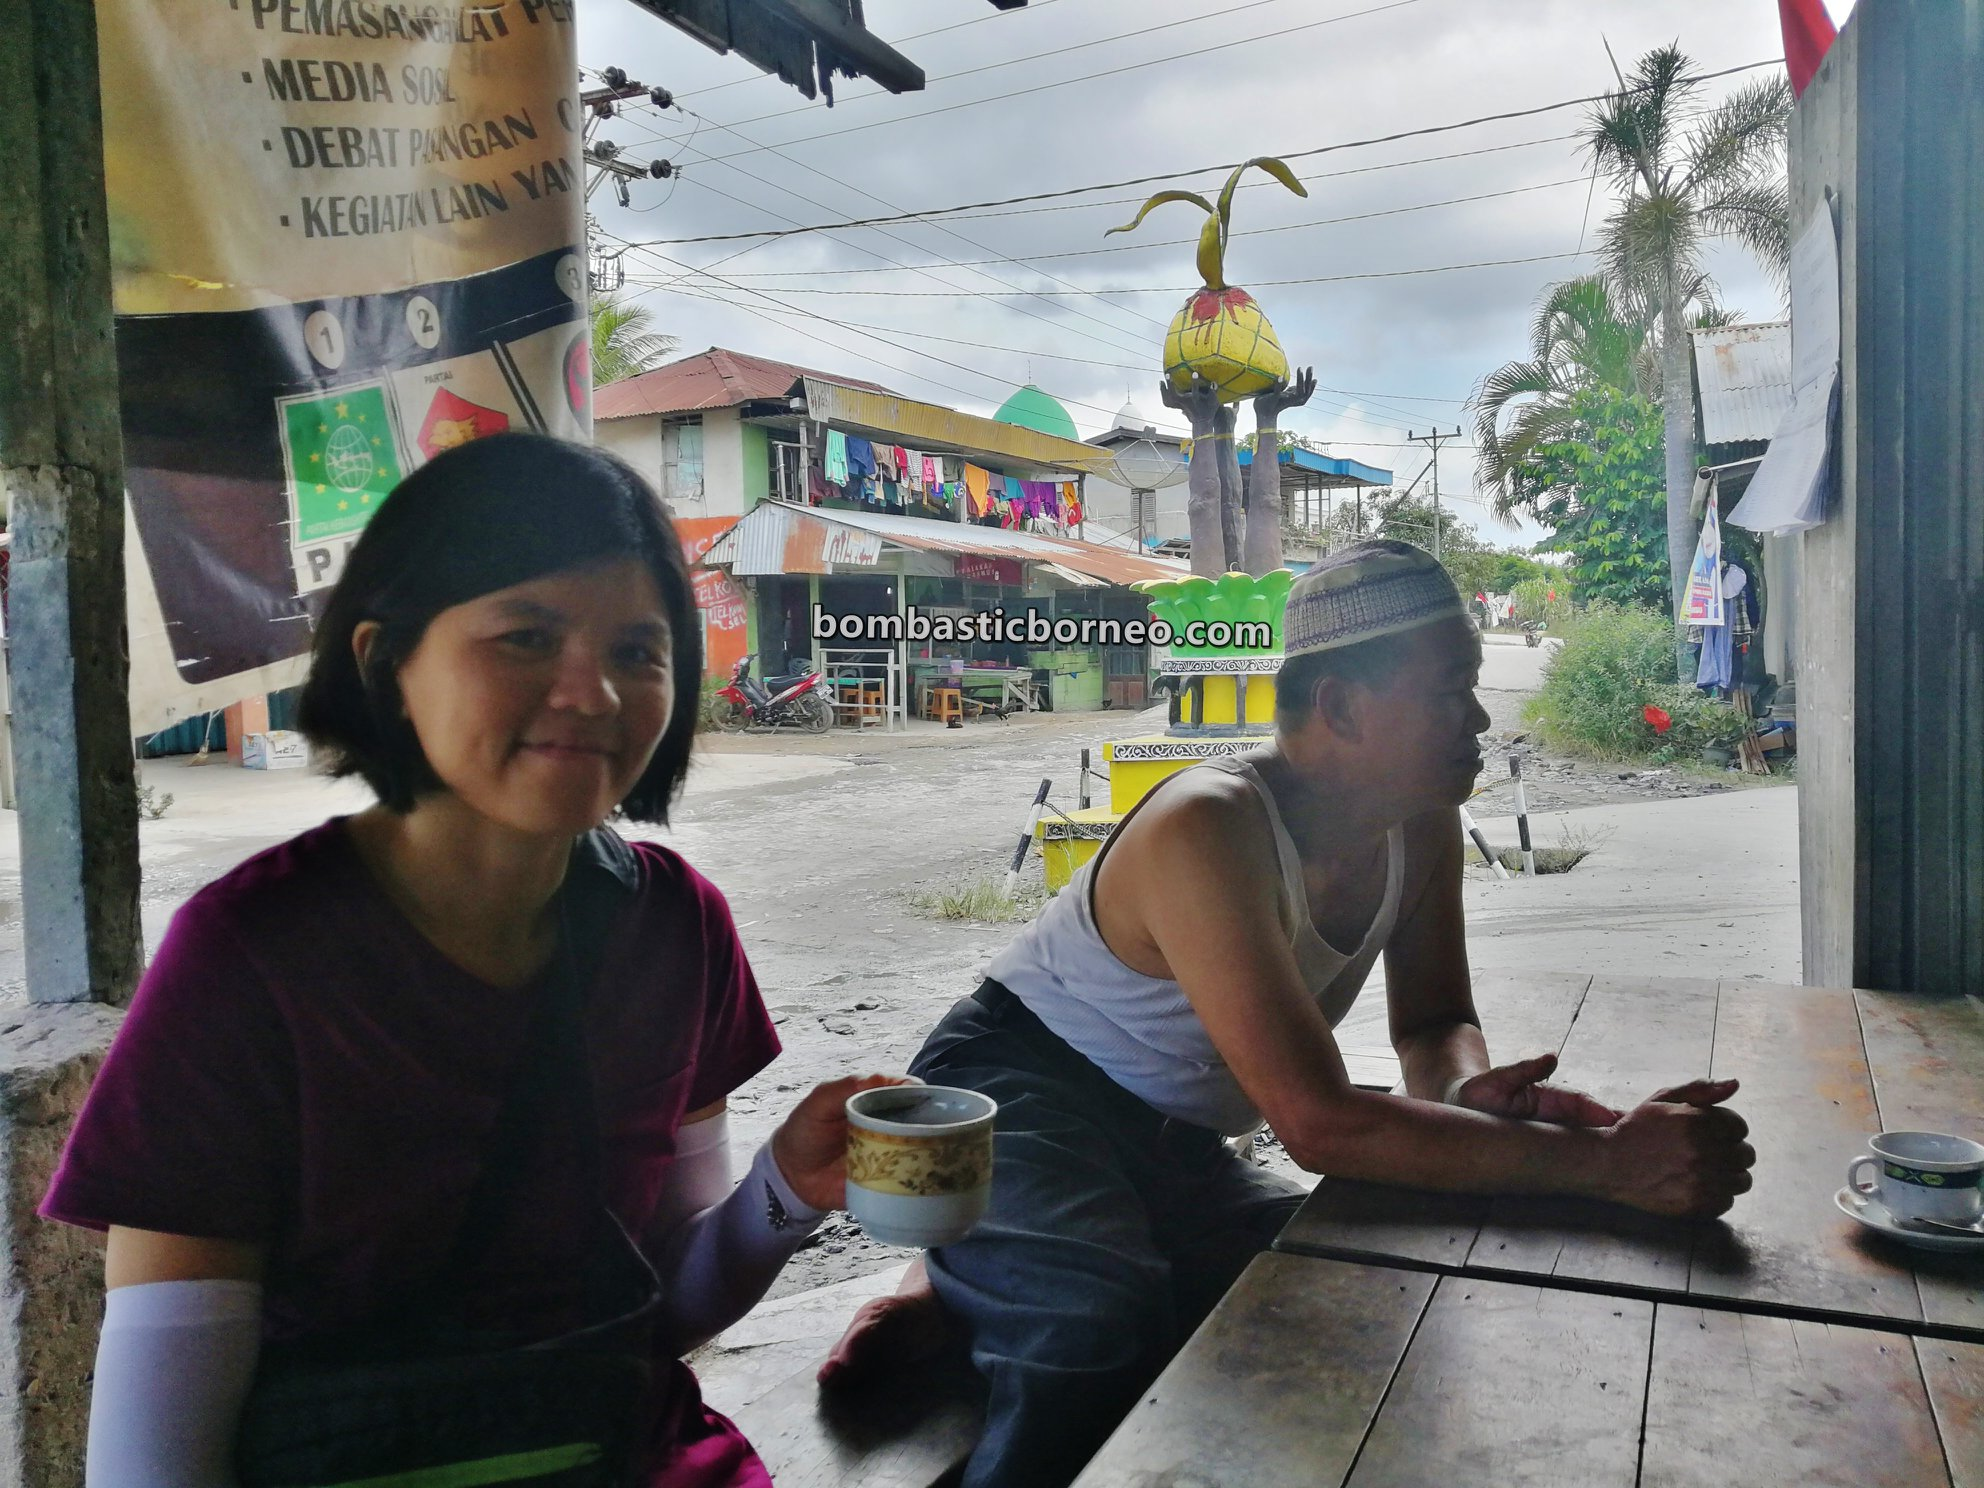 Malay village, Indonesia, Kalimantan Barat, Jawai Selatan, objek wisata, Tourism, tourist attraction, travel guide, Parit Setia, Borneo, 穿越探索跨境婆罗洲游踪, 印尼西加里曼丹, 三发马来渔村